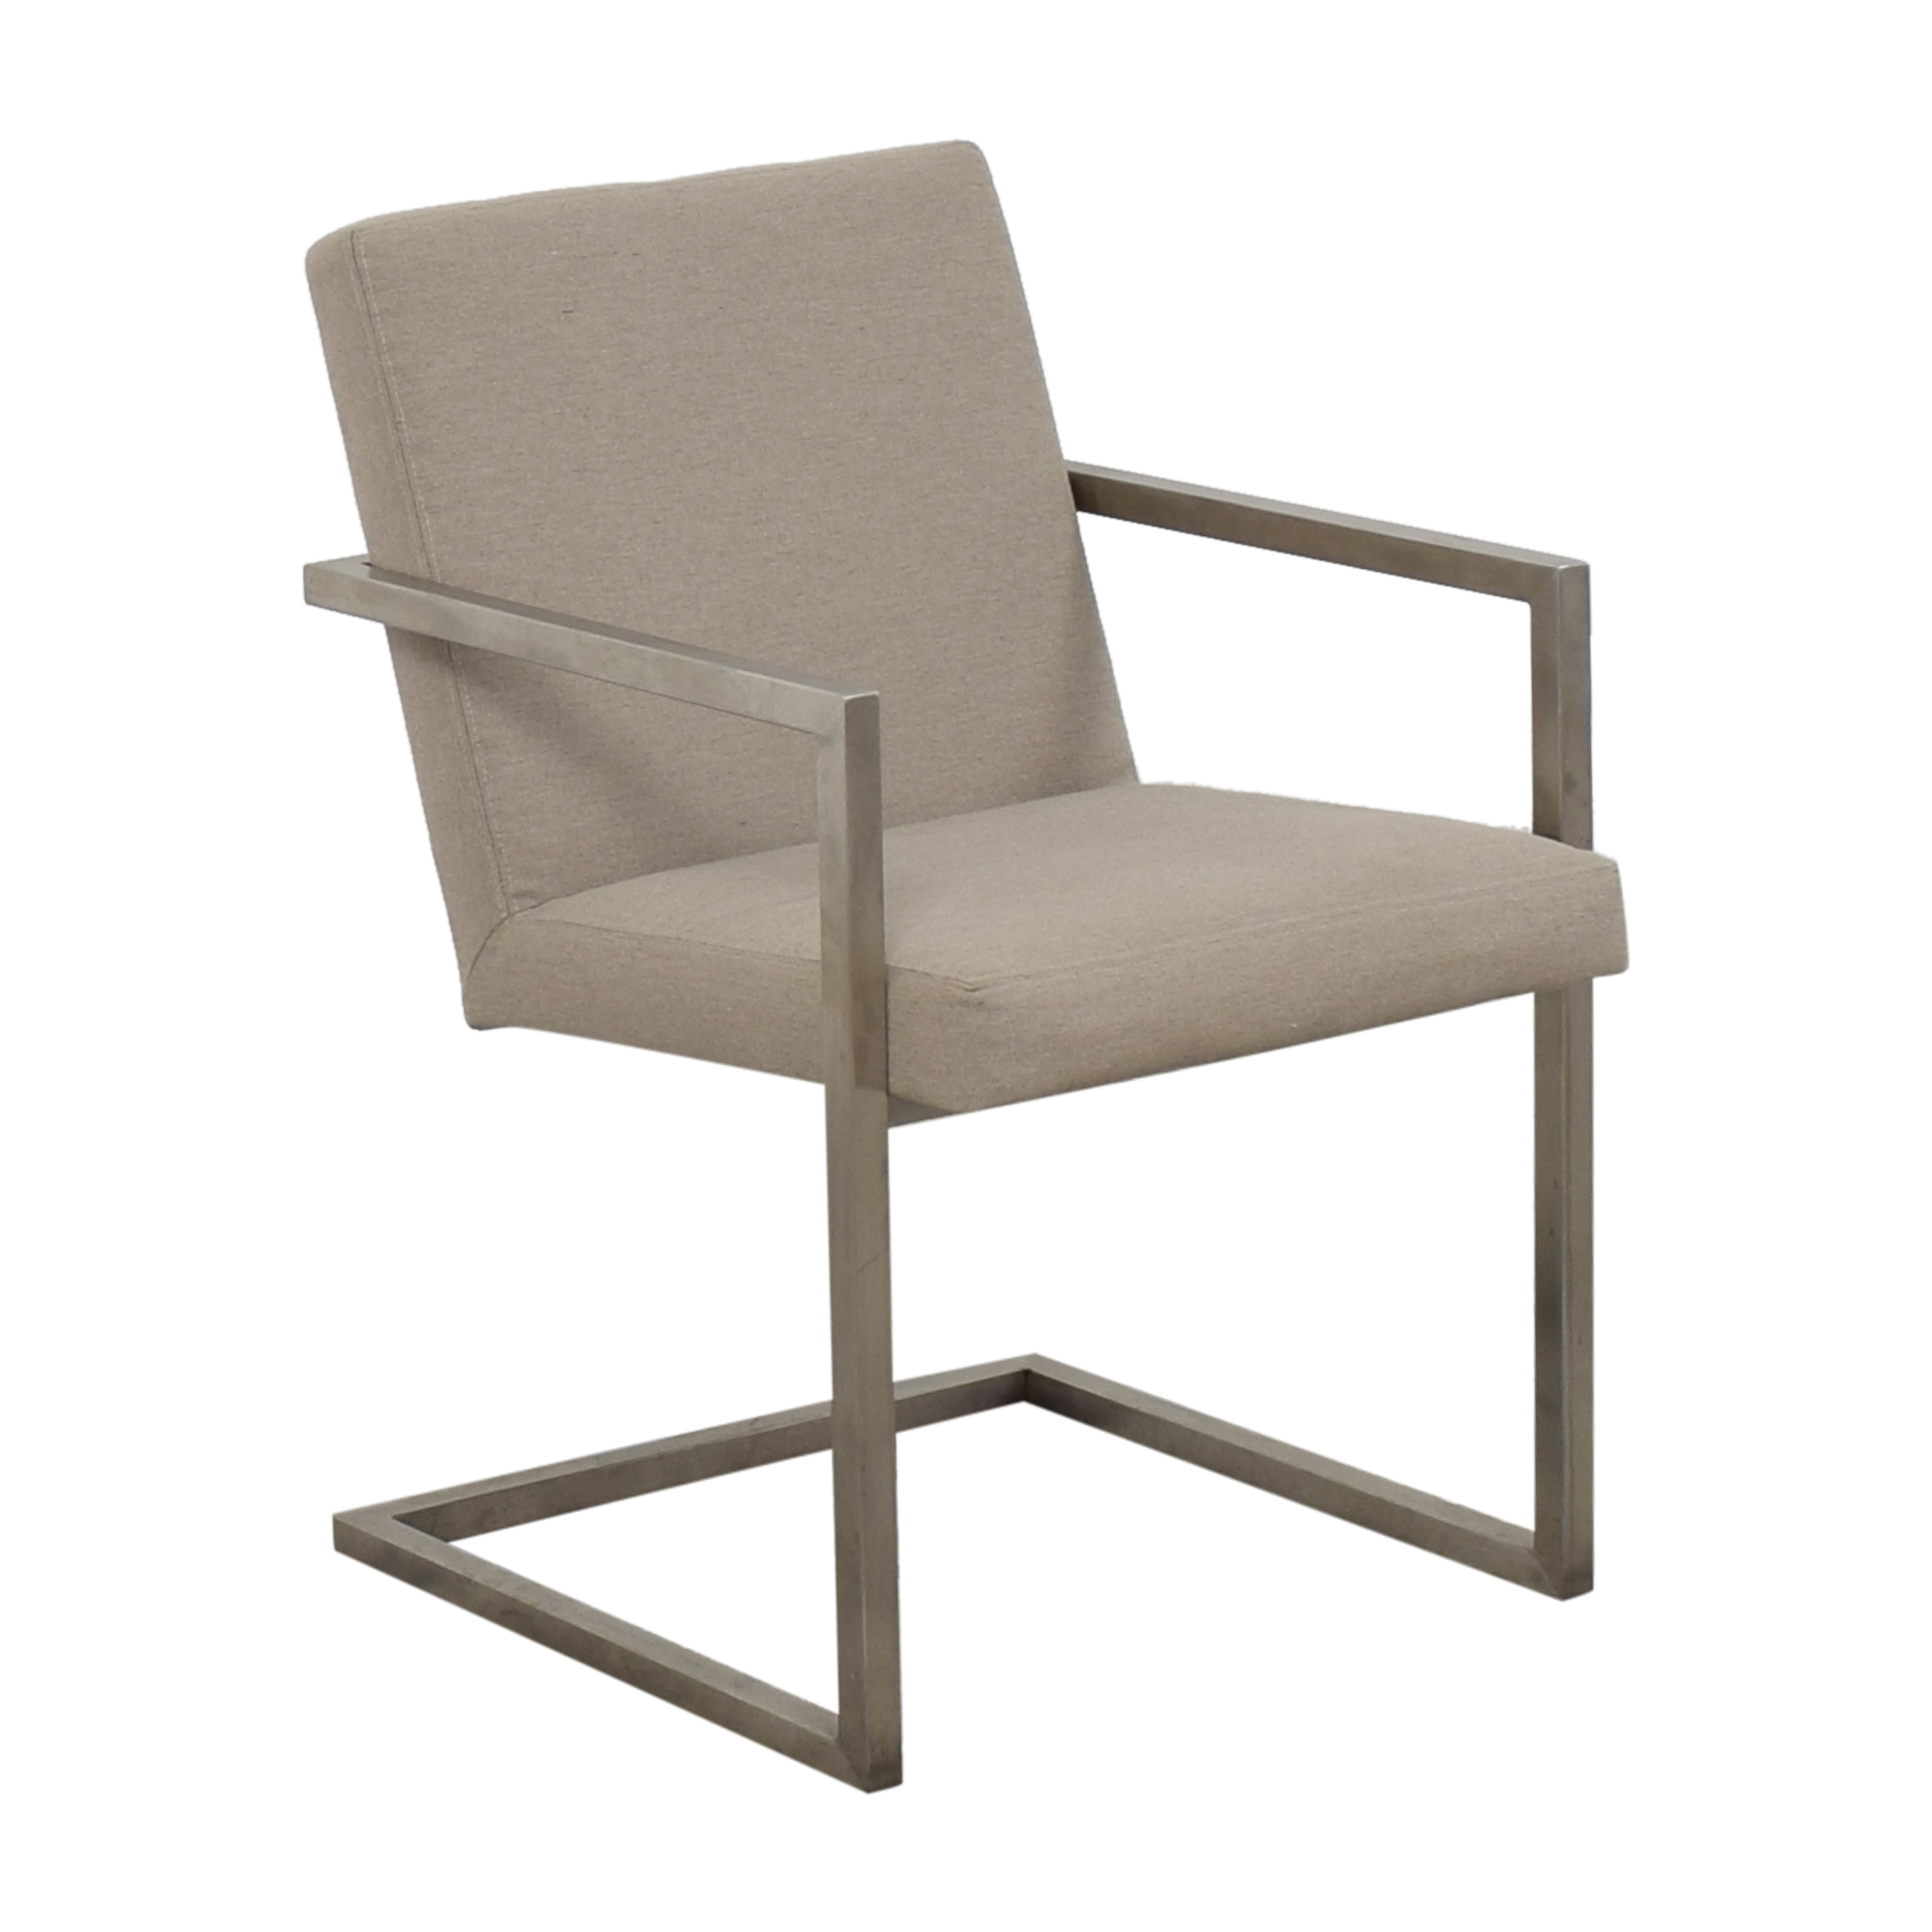 Room & Board Room & Board Lira Dining Arm Chair ma